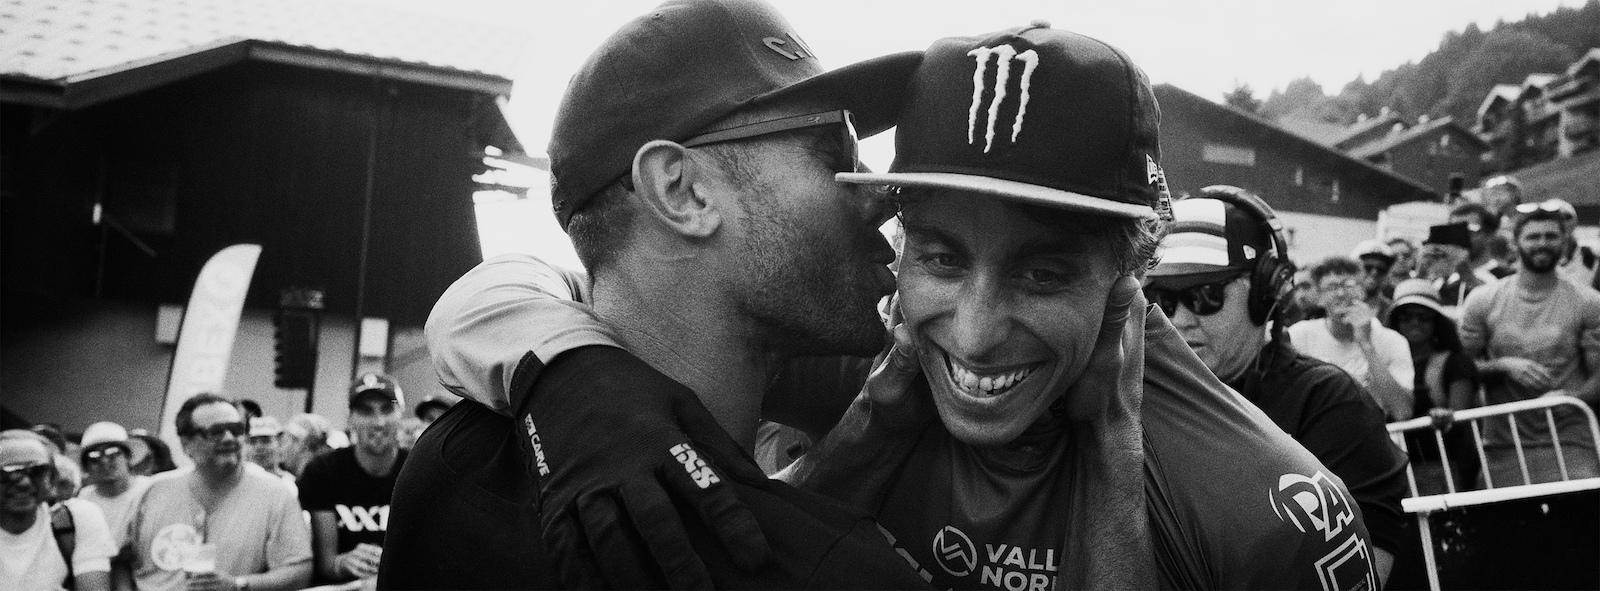 Fabien Barel congratulating Amaury in Les Gets.